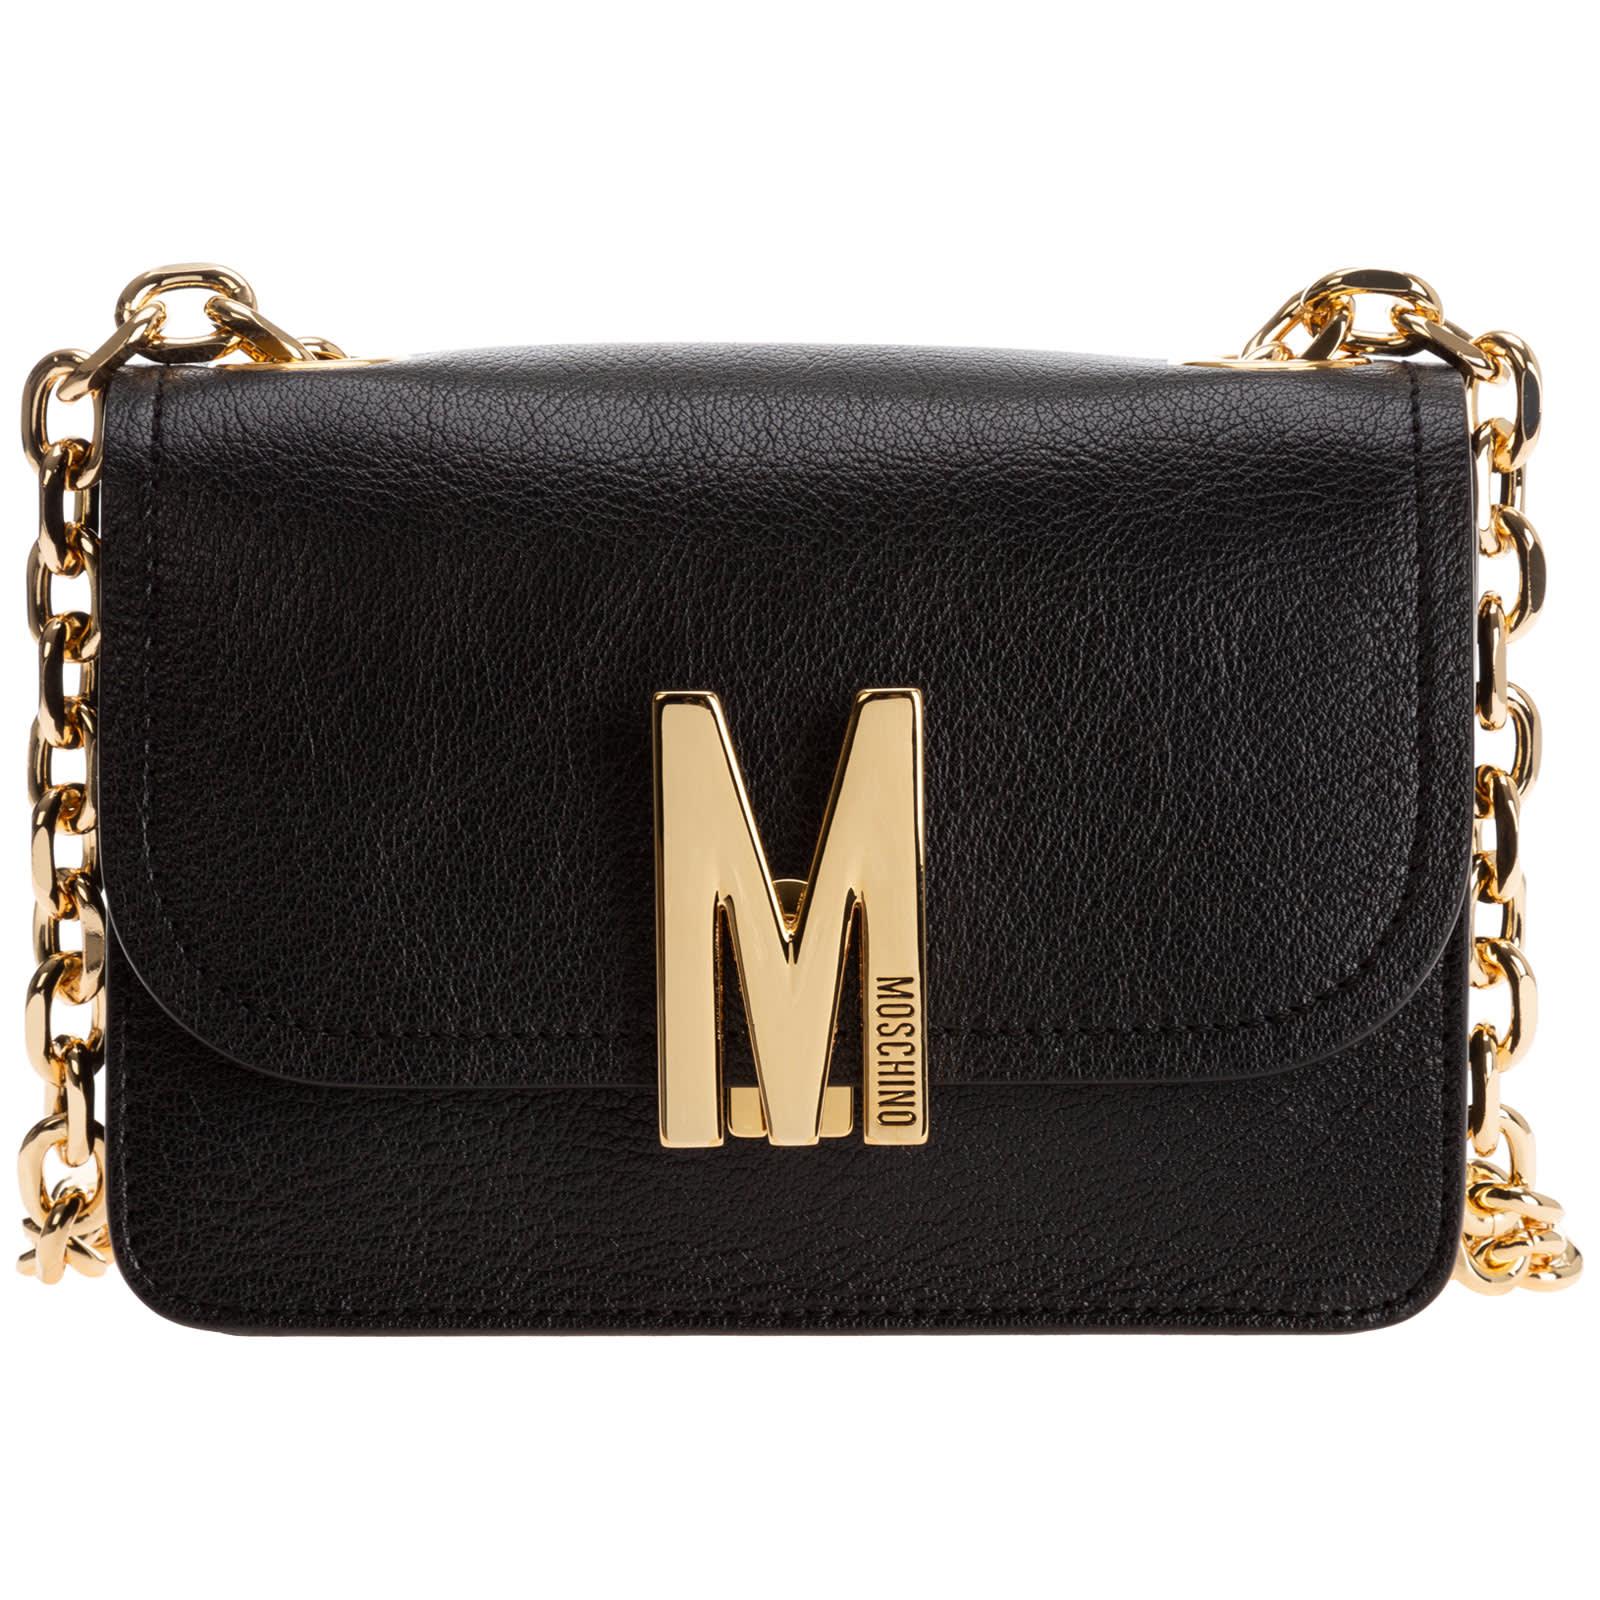 Moschino M Shoulder Bag In Nero